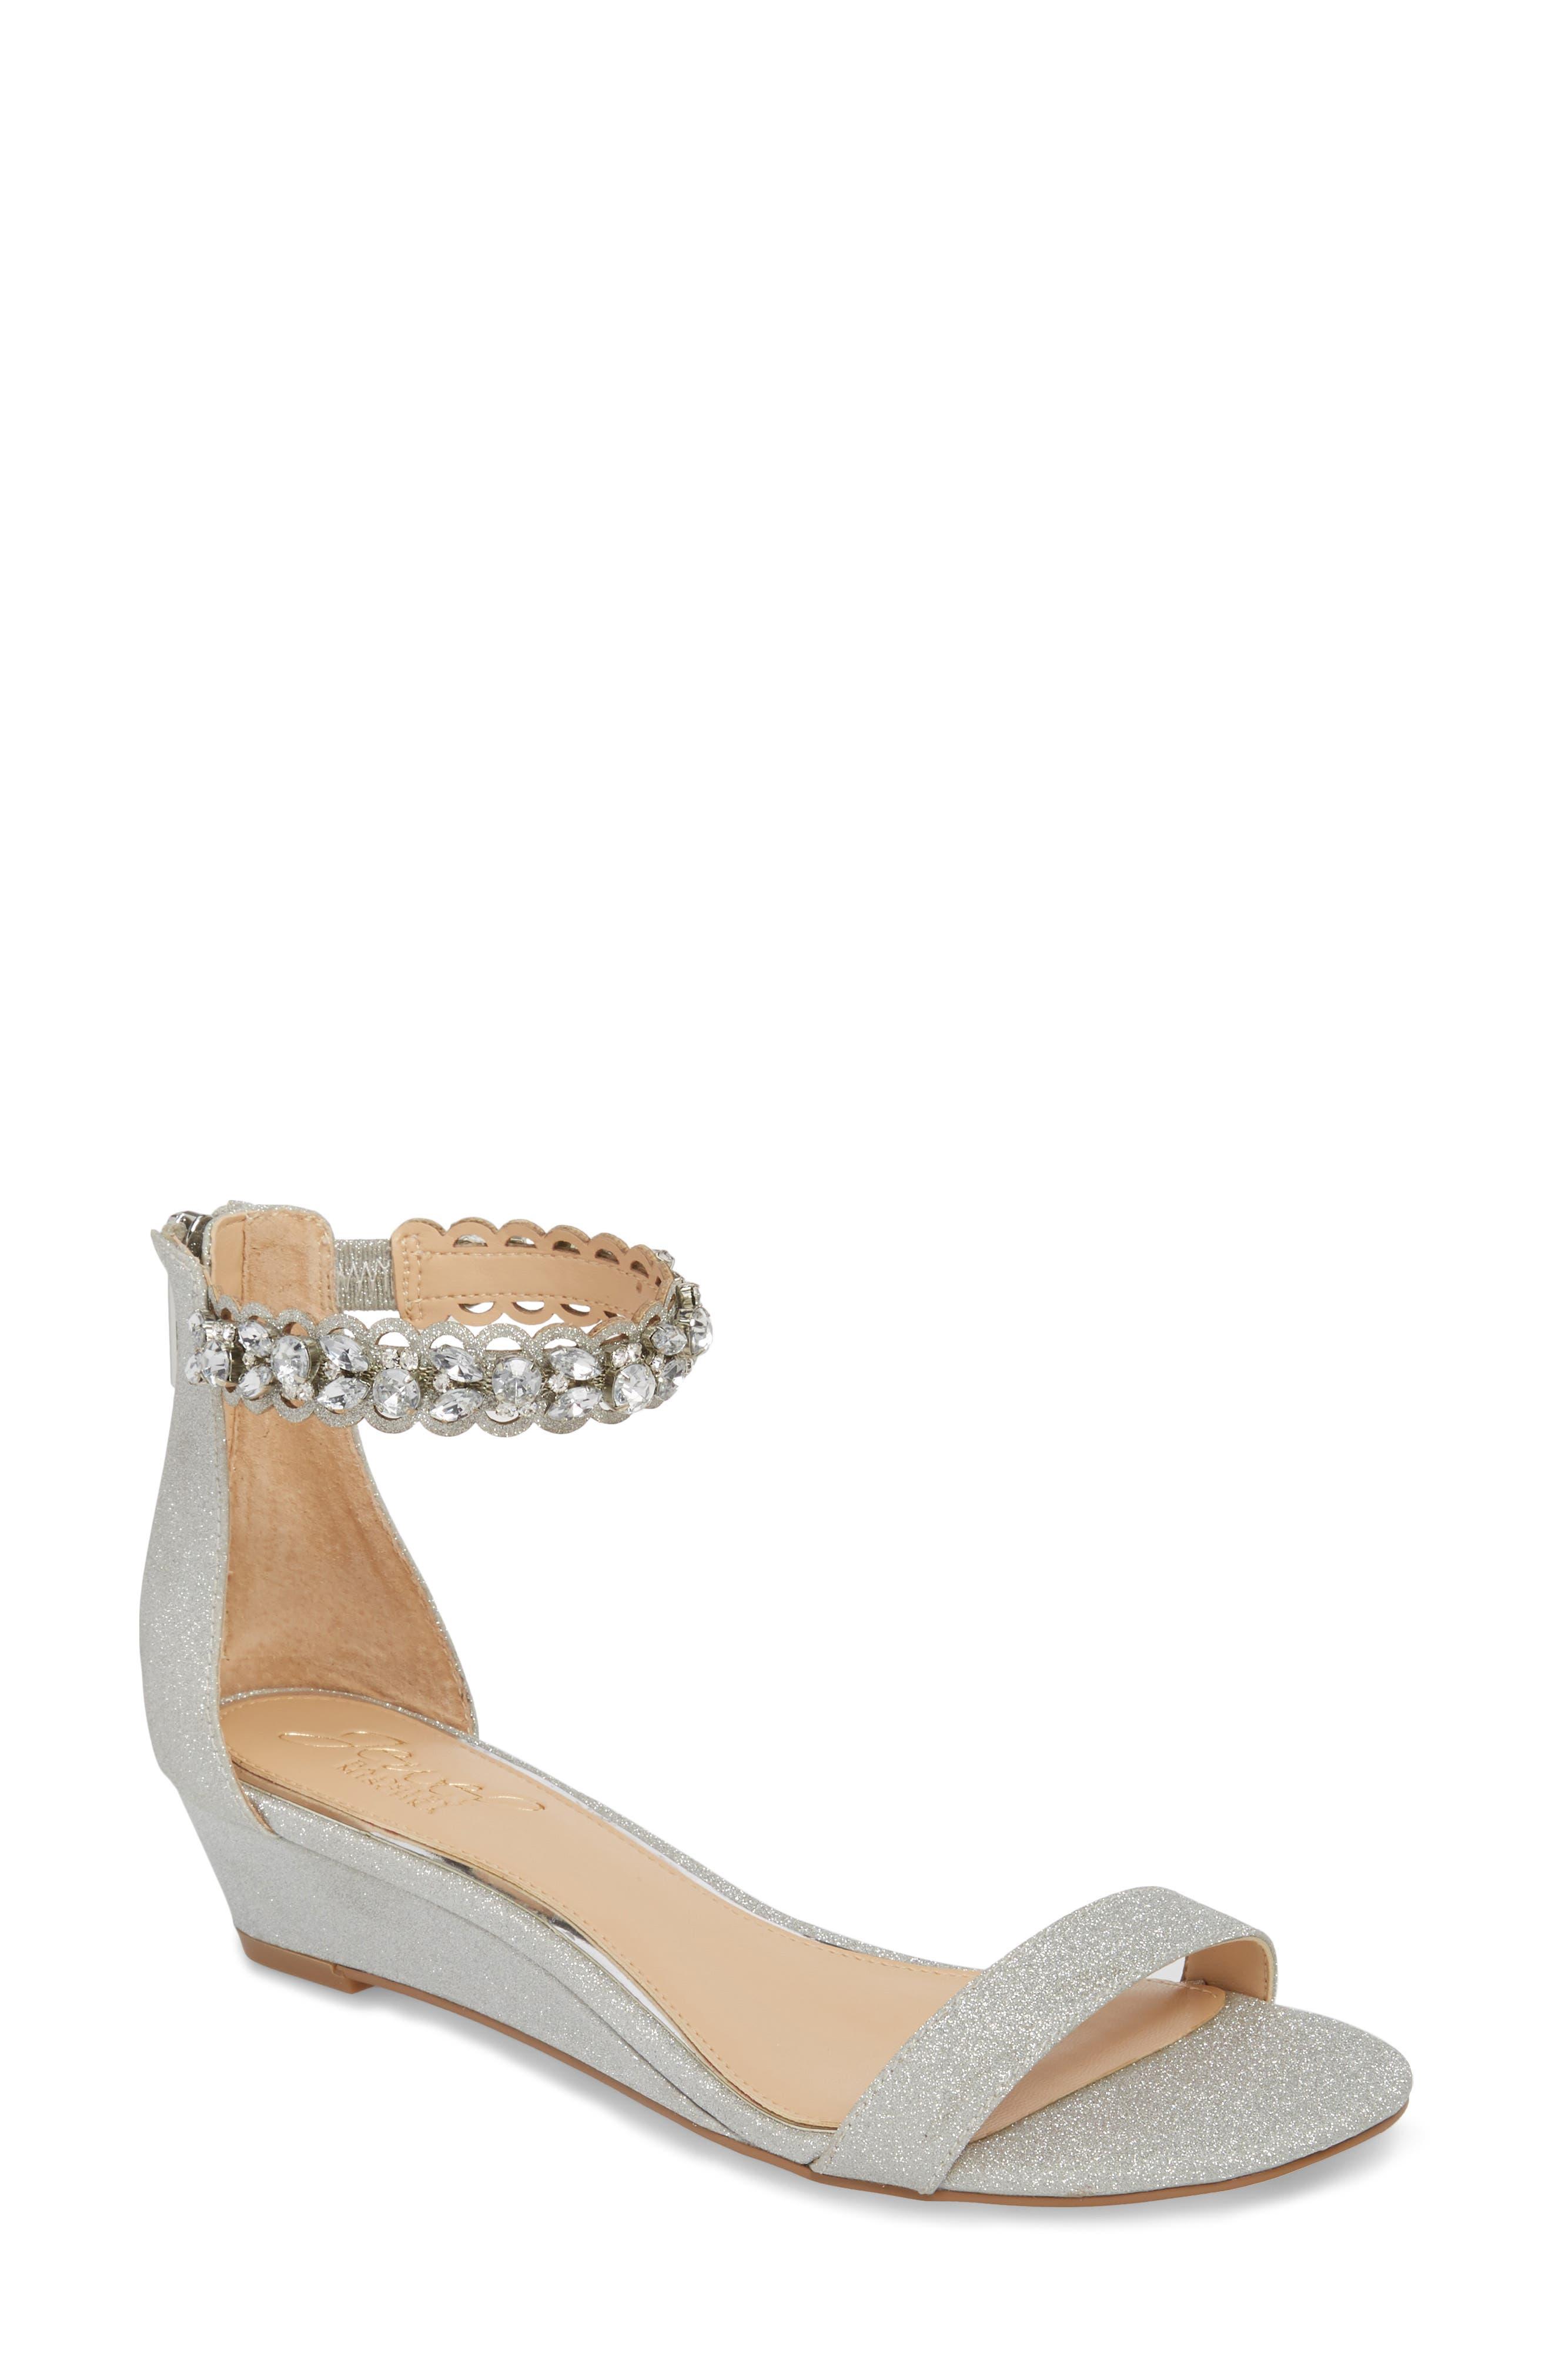 Jewel Badgley Mischka Ginger Wedge Sandal (Women)